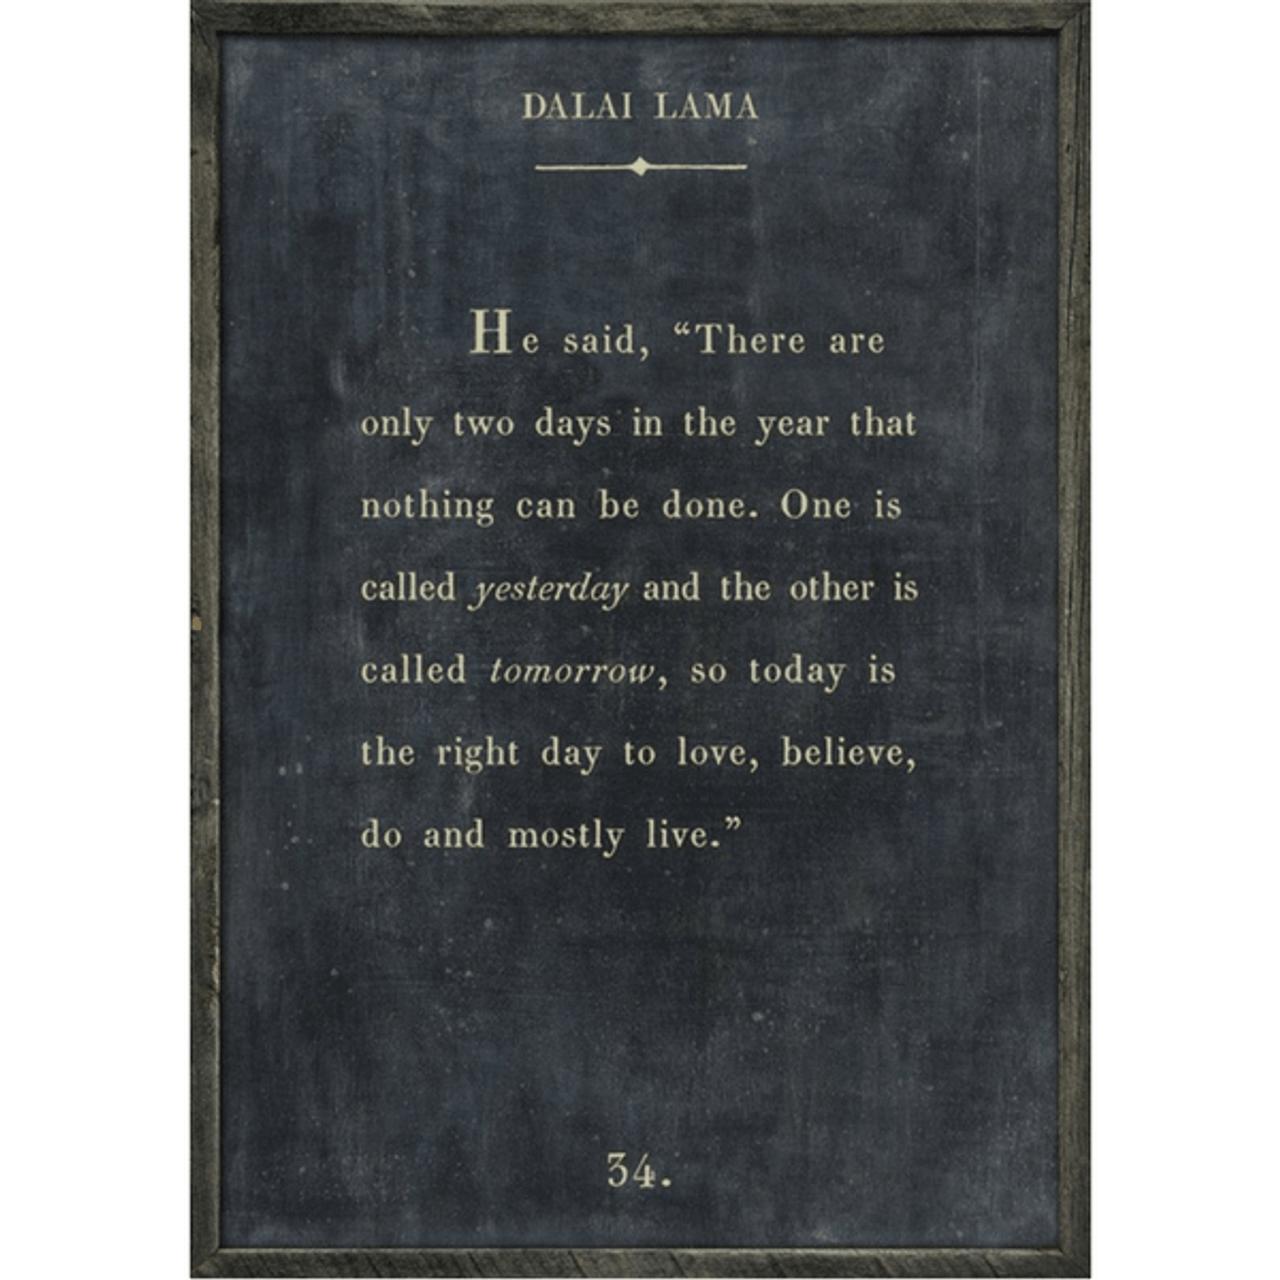 dalai lama art print - charcoal with grey wood frame